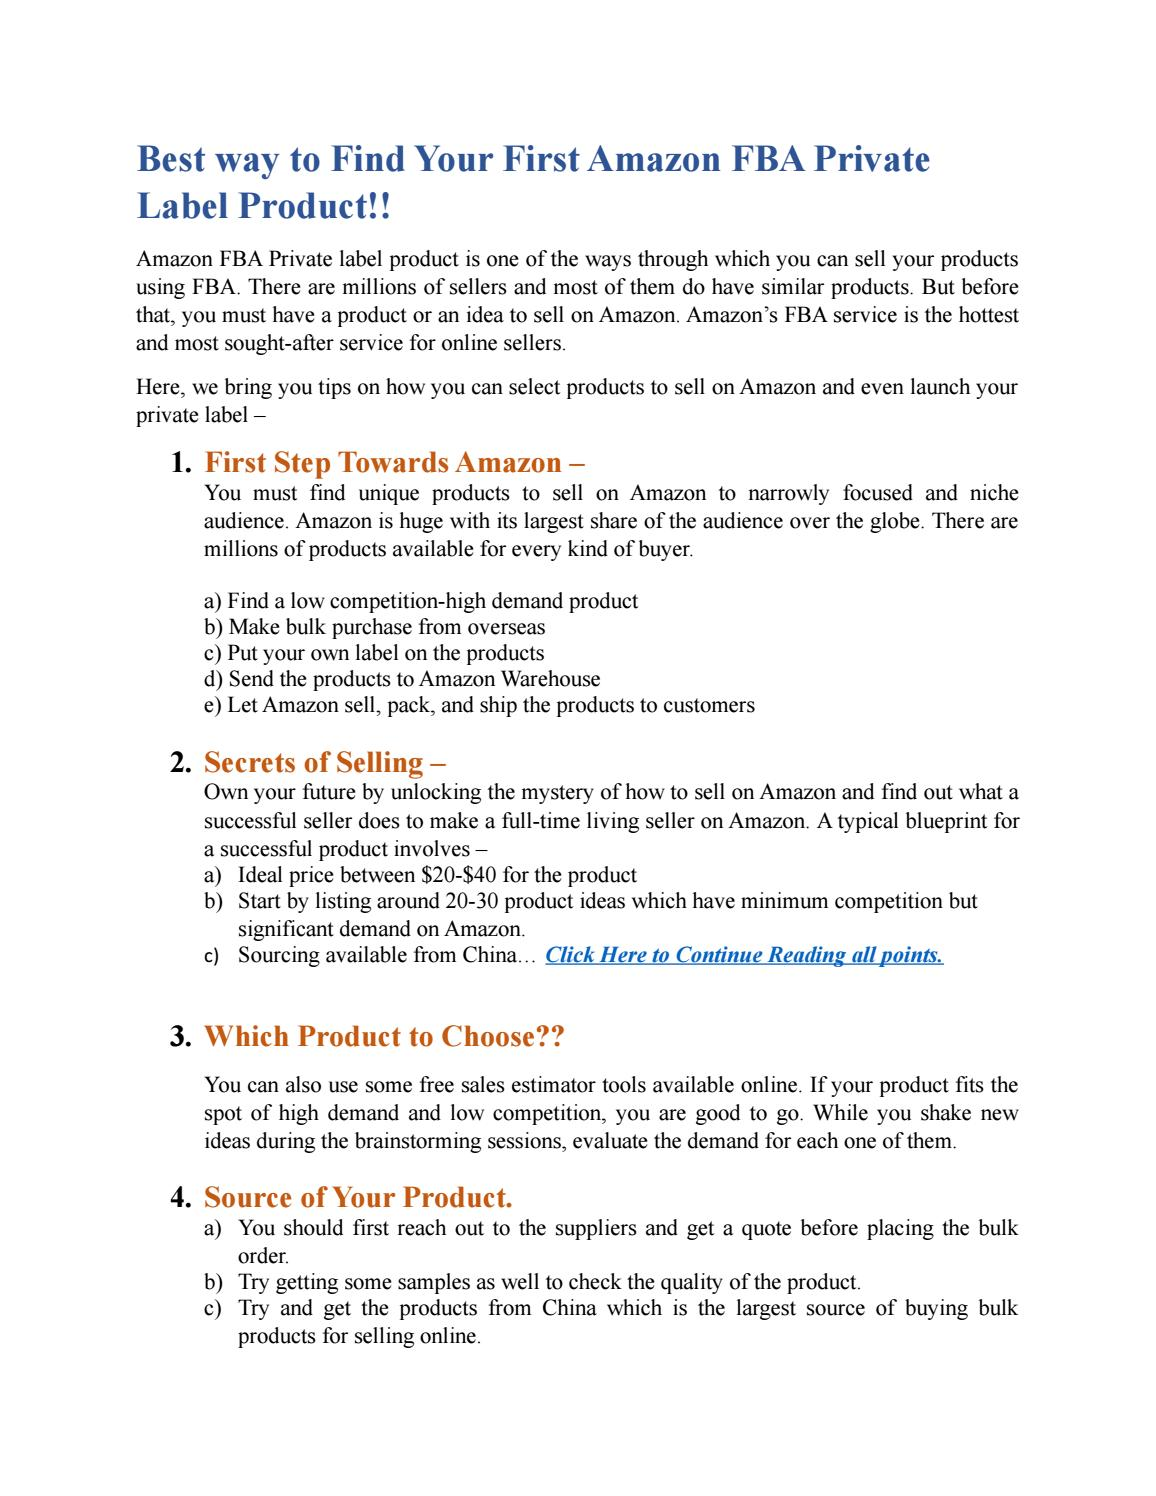 amazon free sales estimator